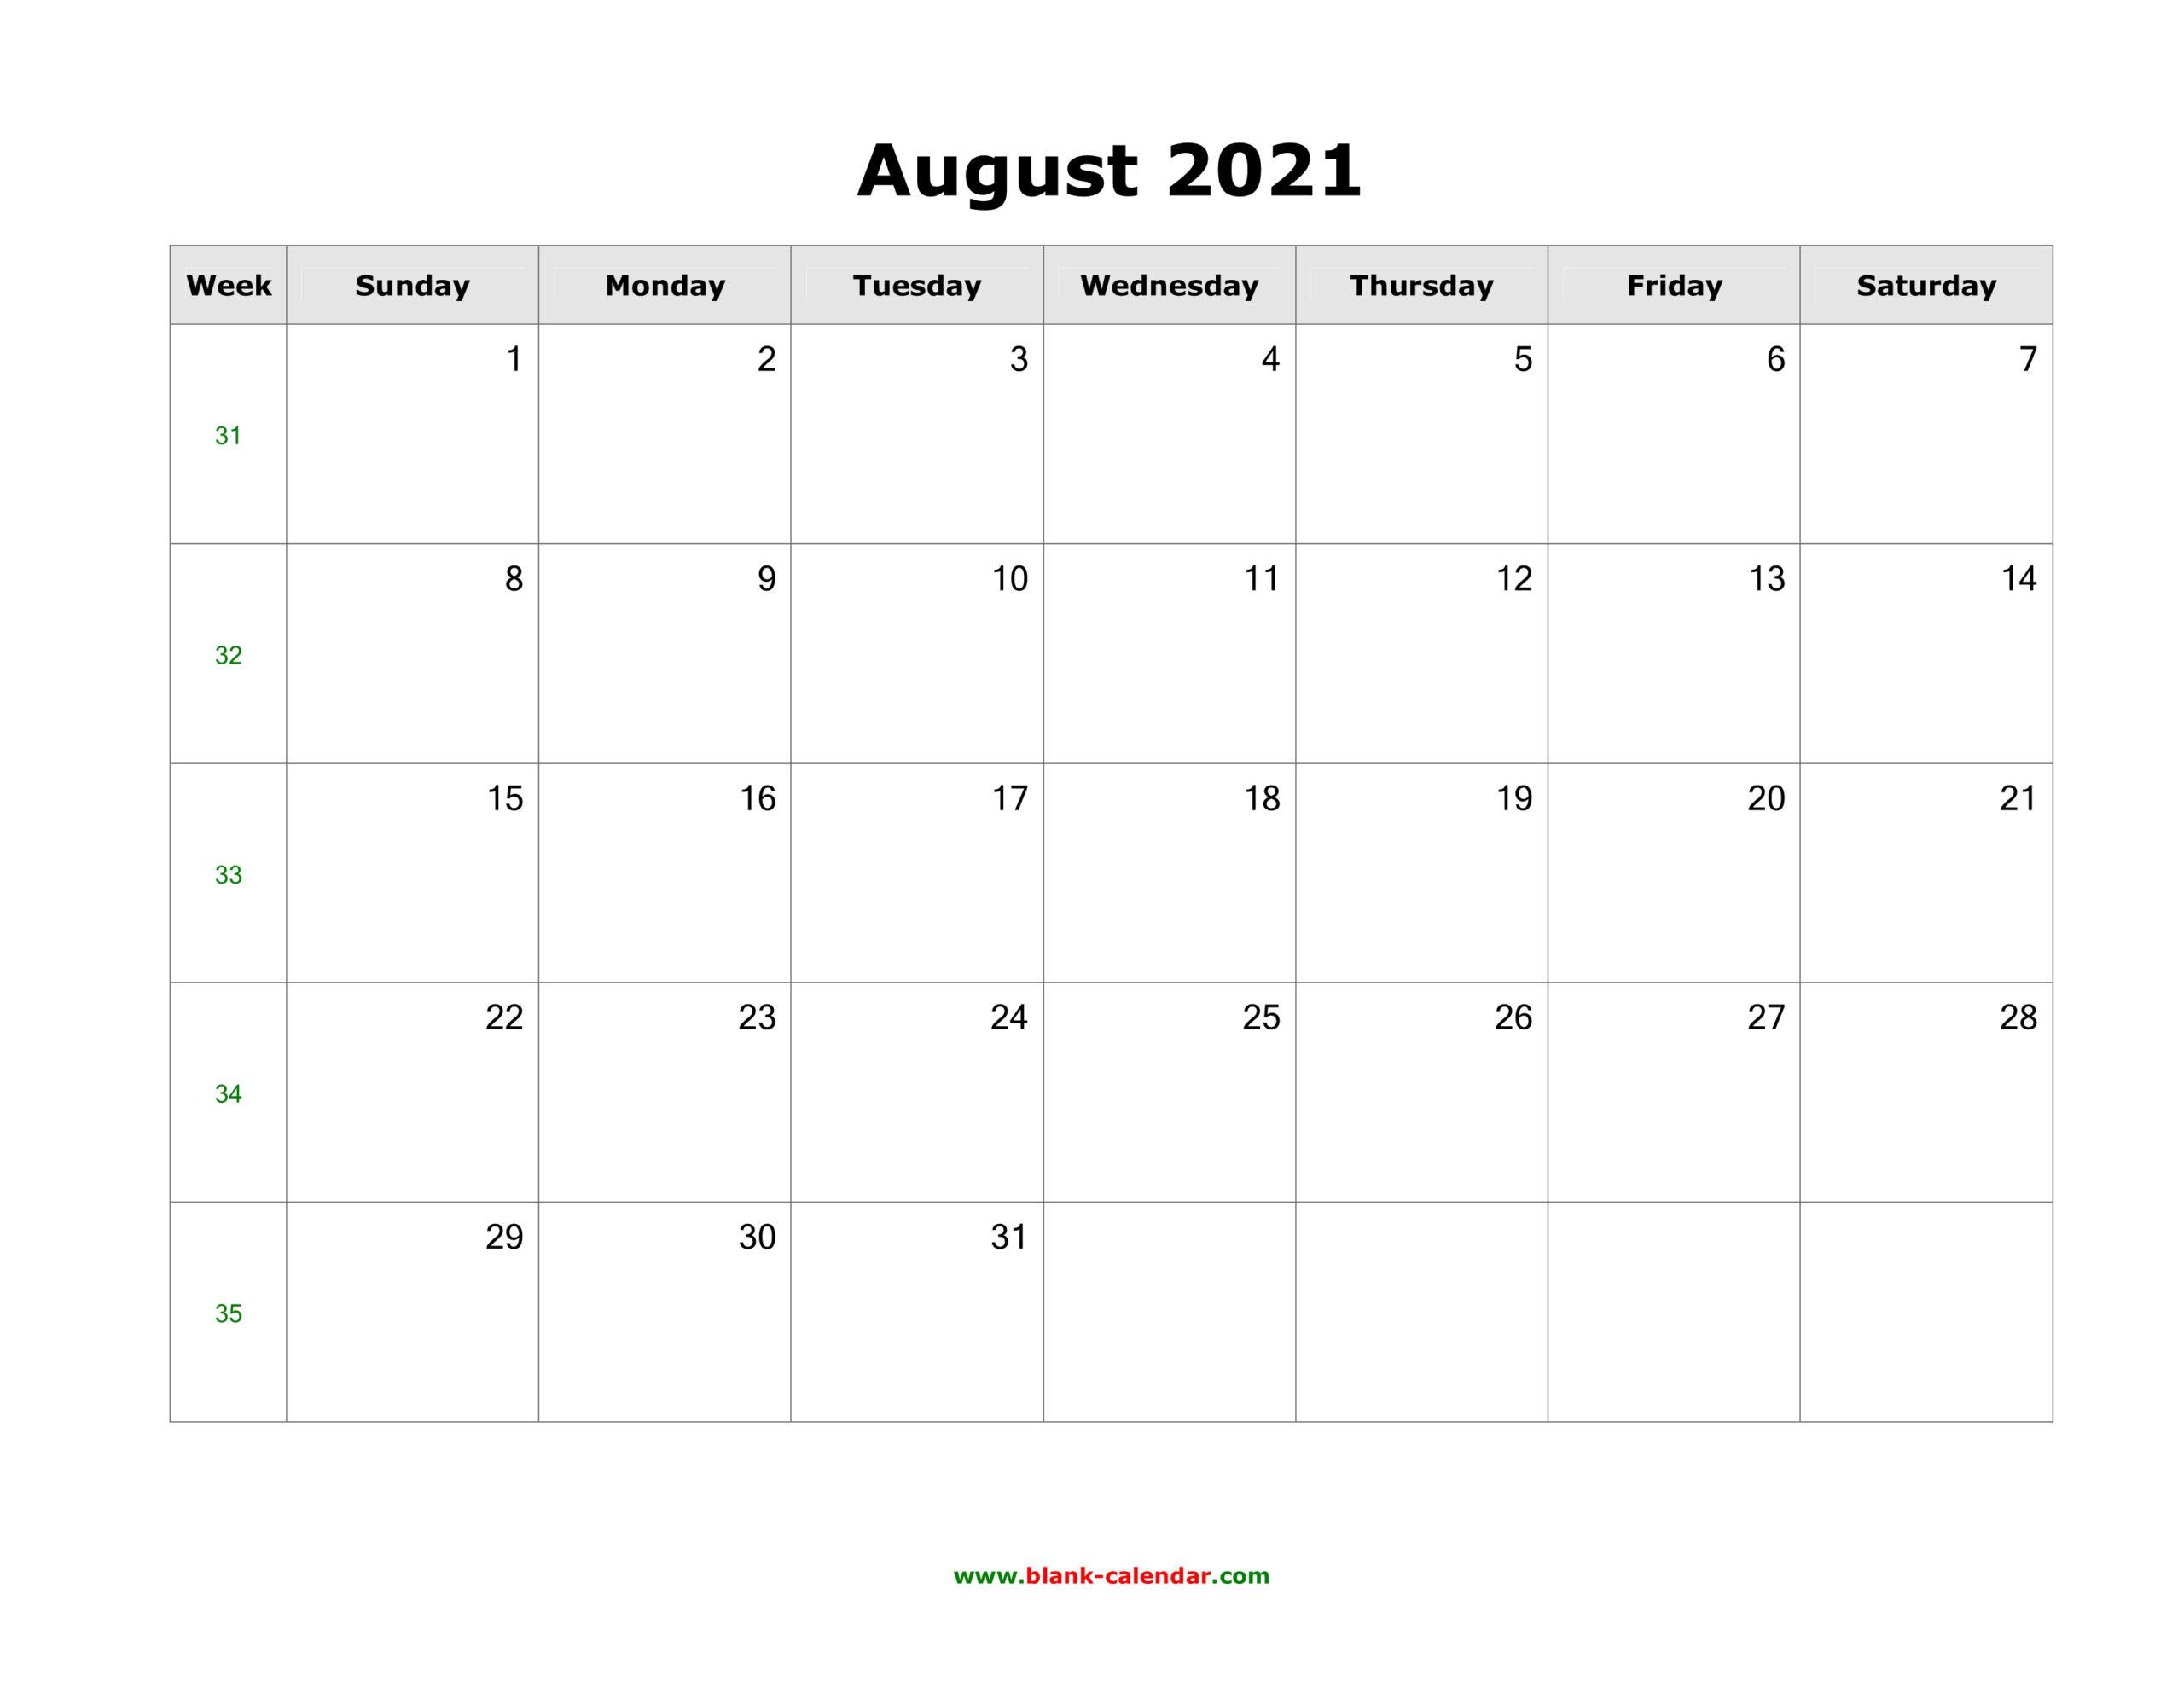 Download August 2021 Blank Calendar (Horizontal) within August 2021 Template Calendar